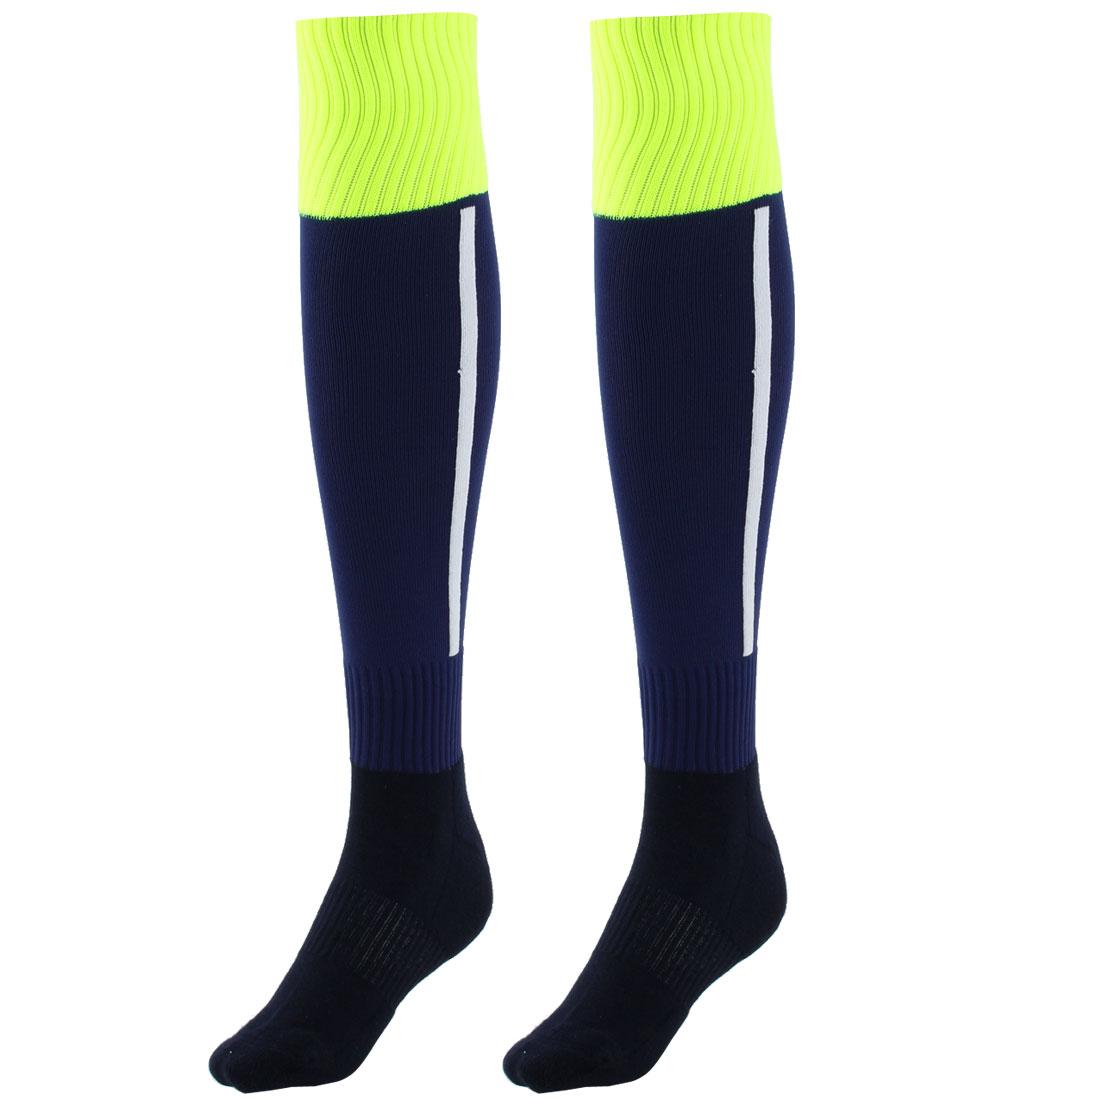 Men Sport Nylon Knee High Elastic Cuffs Baseball Football Soccer Long Socks Drak Blue Pair